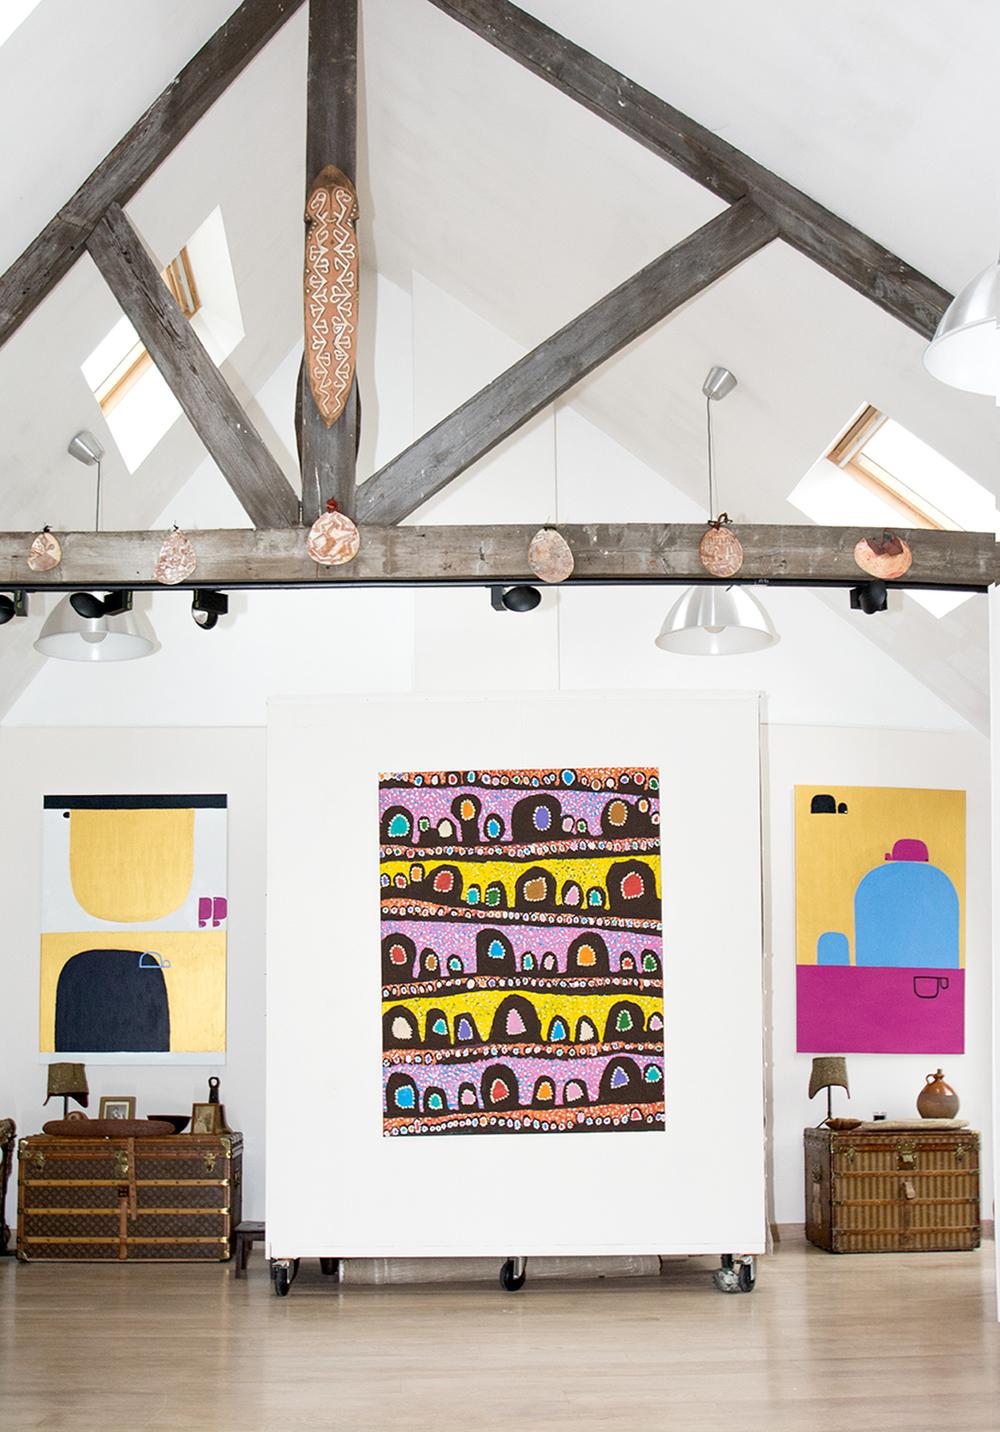 De gauche à droite : l'artiste Naomie Hobson, Linda Napurrula d'Ikuntji, Naomie Hobson. © Ikuntji artists © Lockhart River art centre